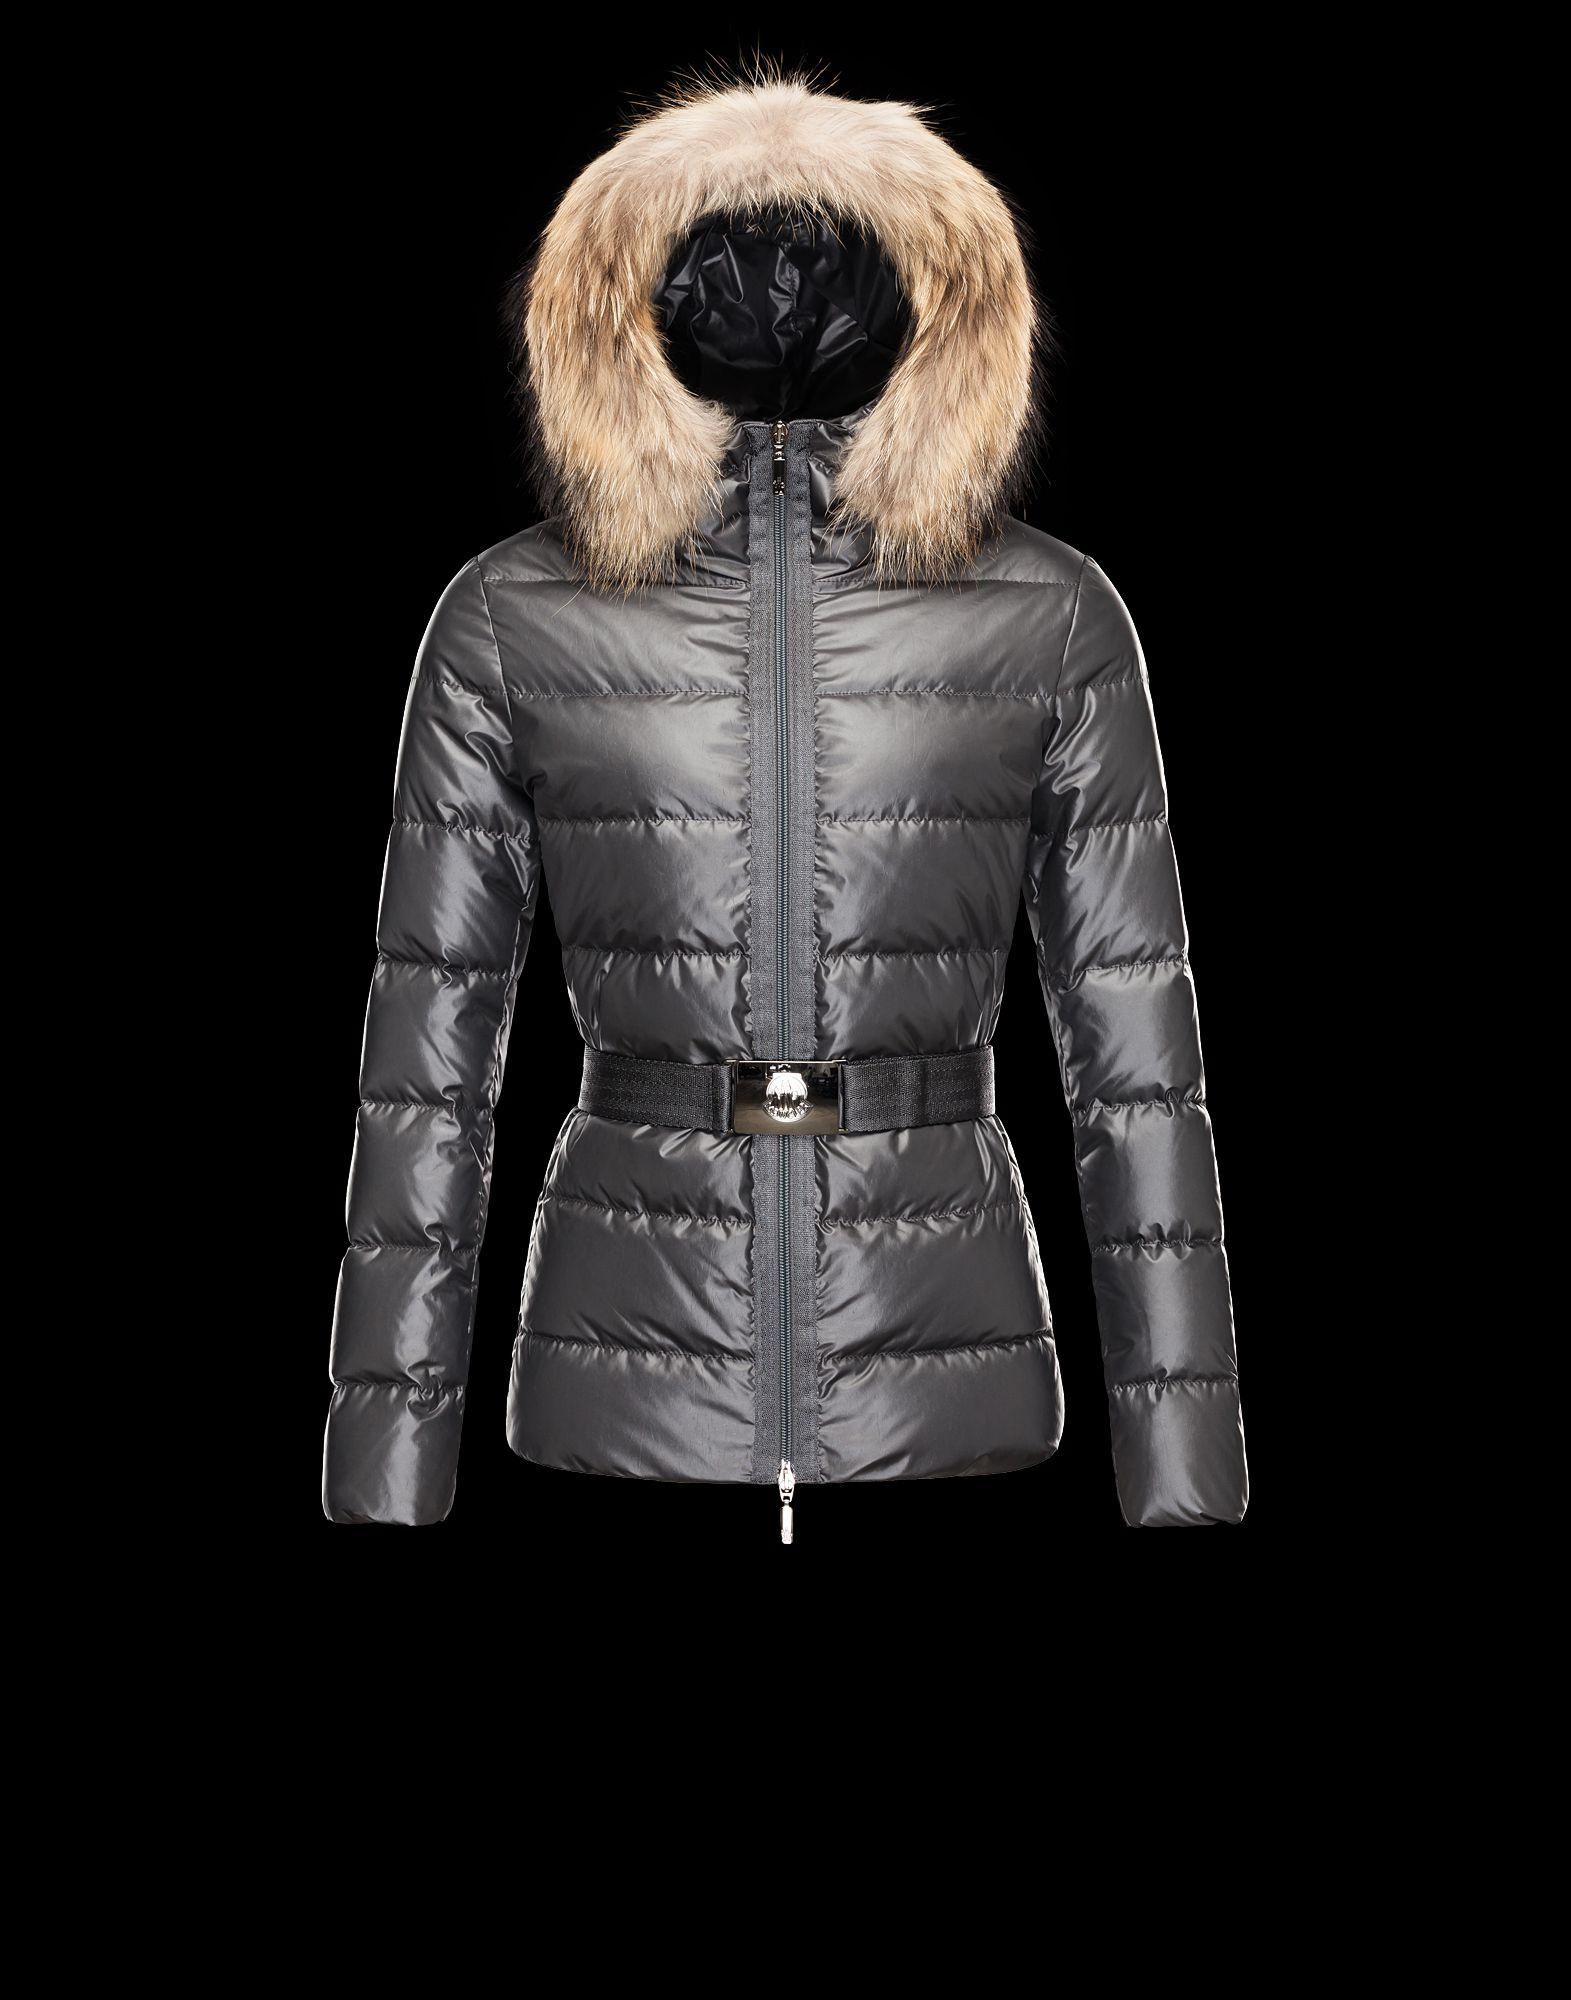 Jacket Women Moncler - Original products on store.moncler.com